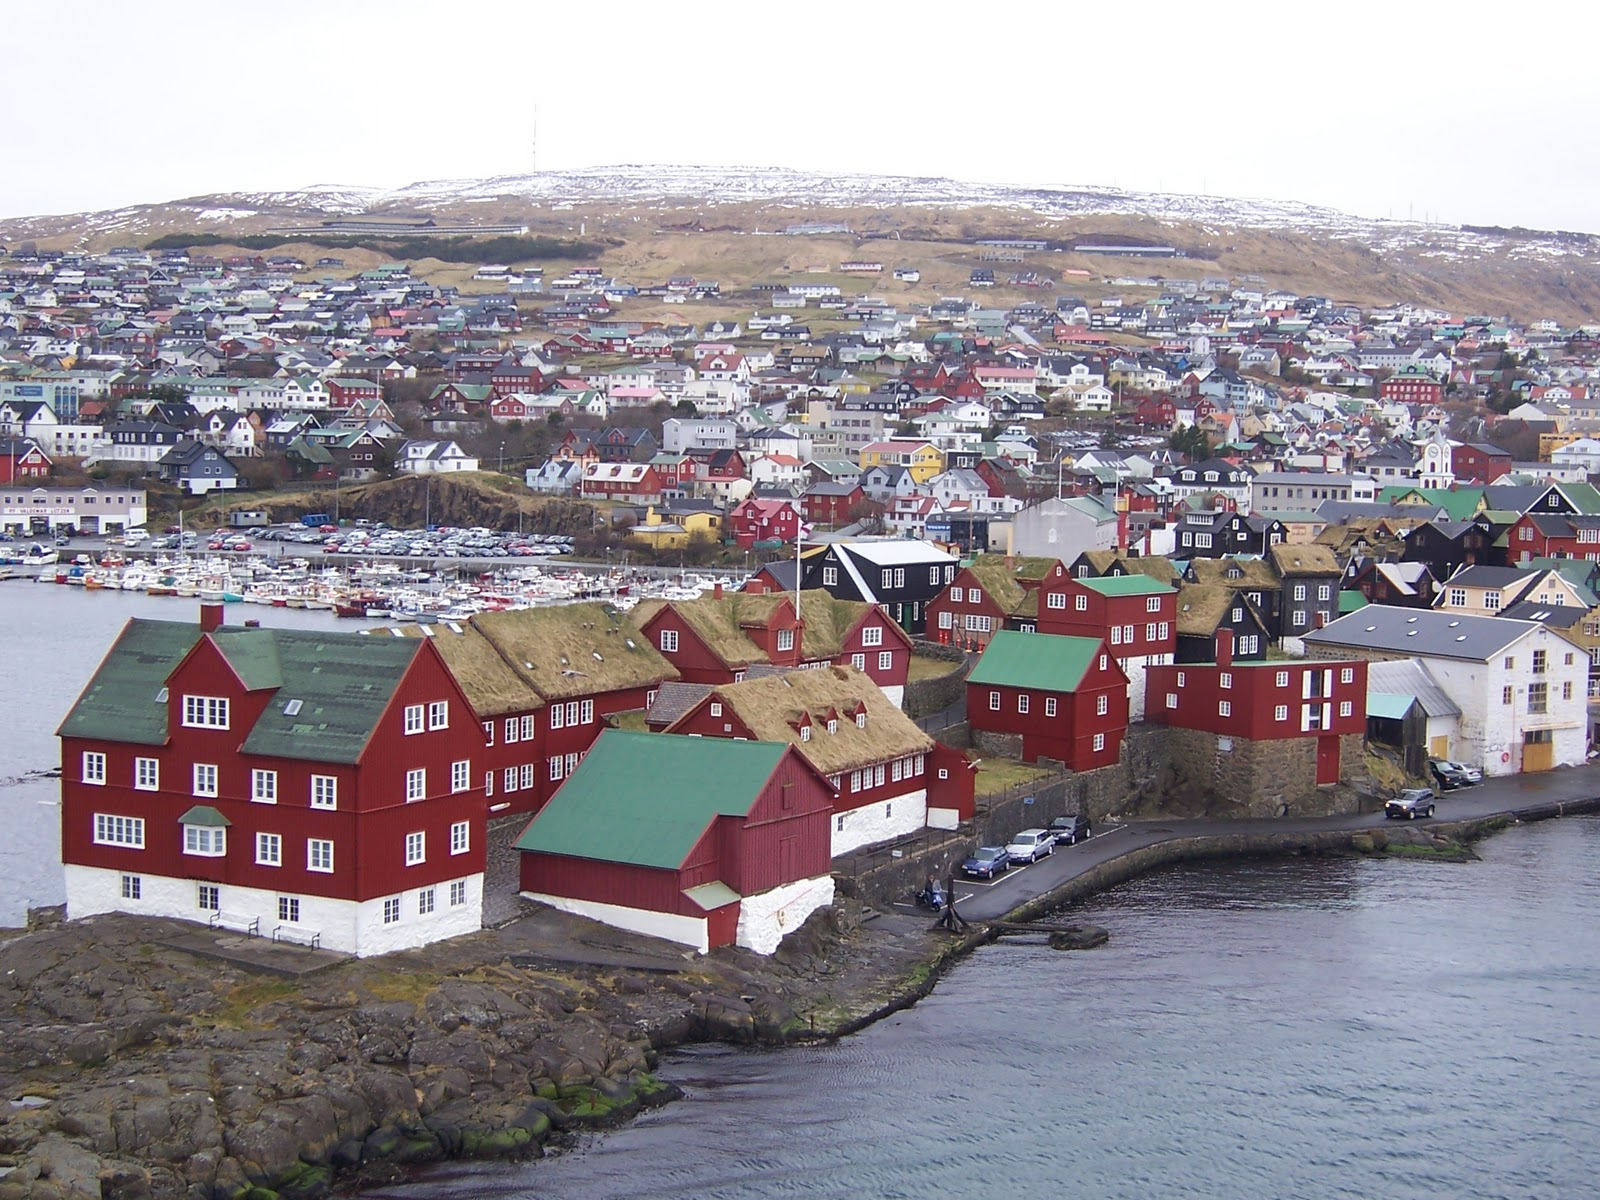 Ilhas Faroë, Território Externo da Dinamarca